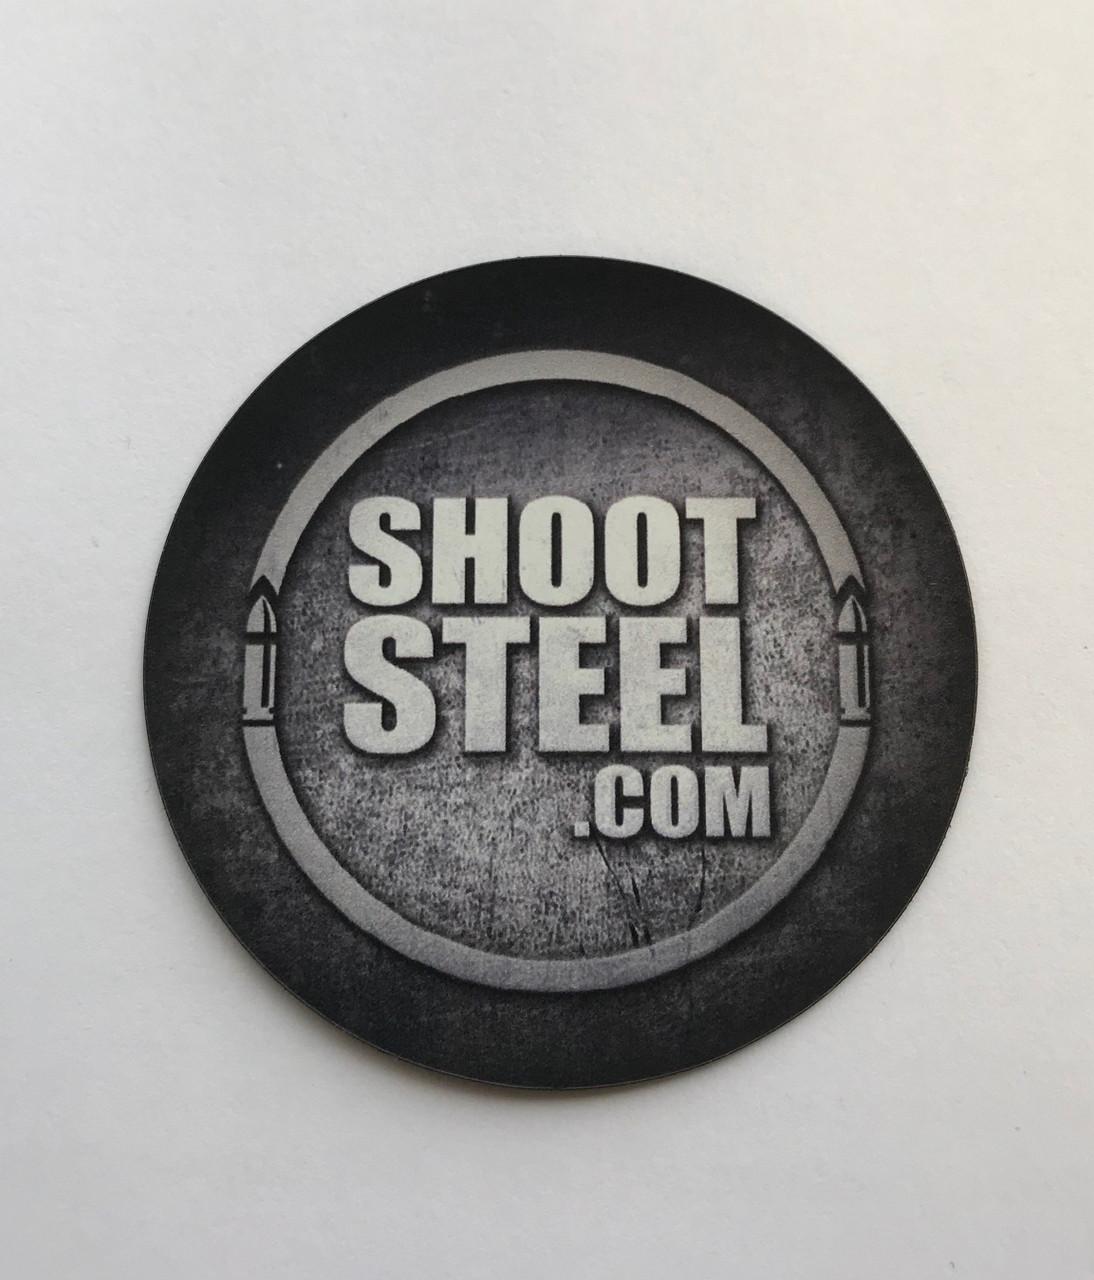 Shootsteel.com magnet